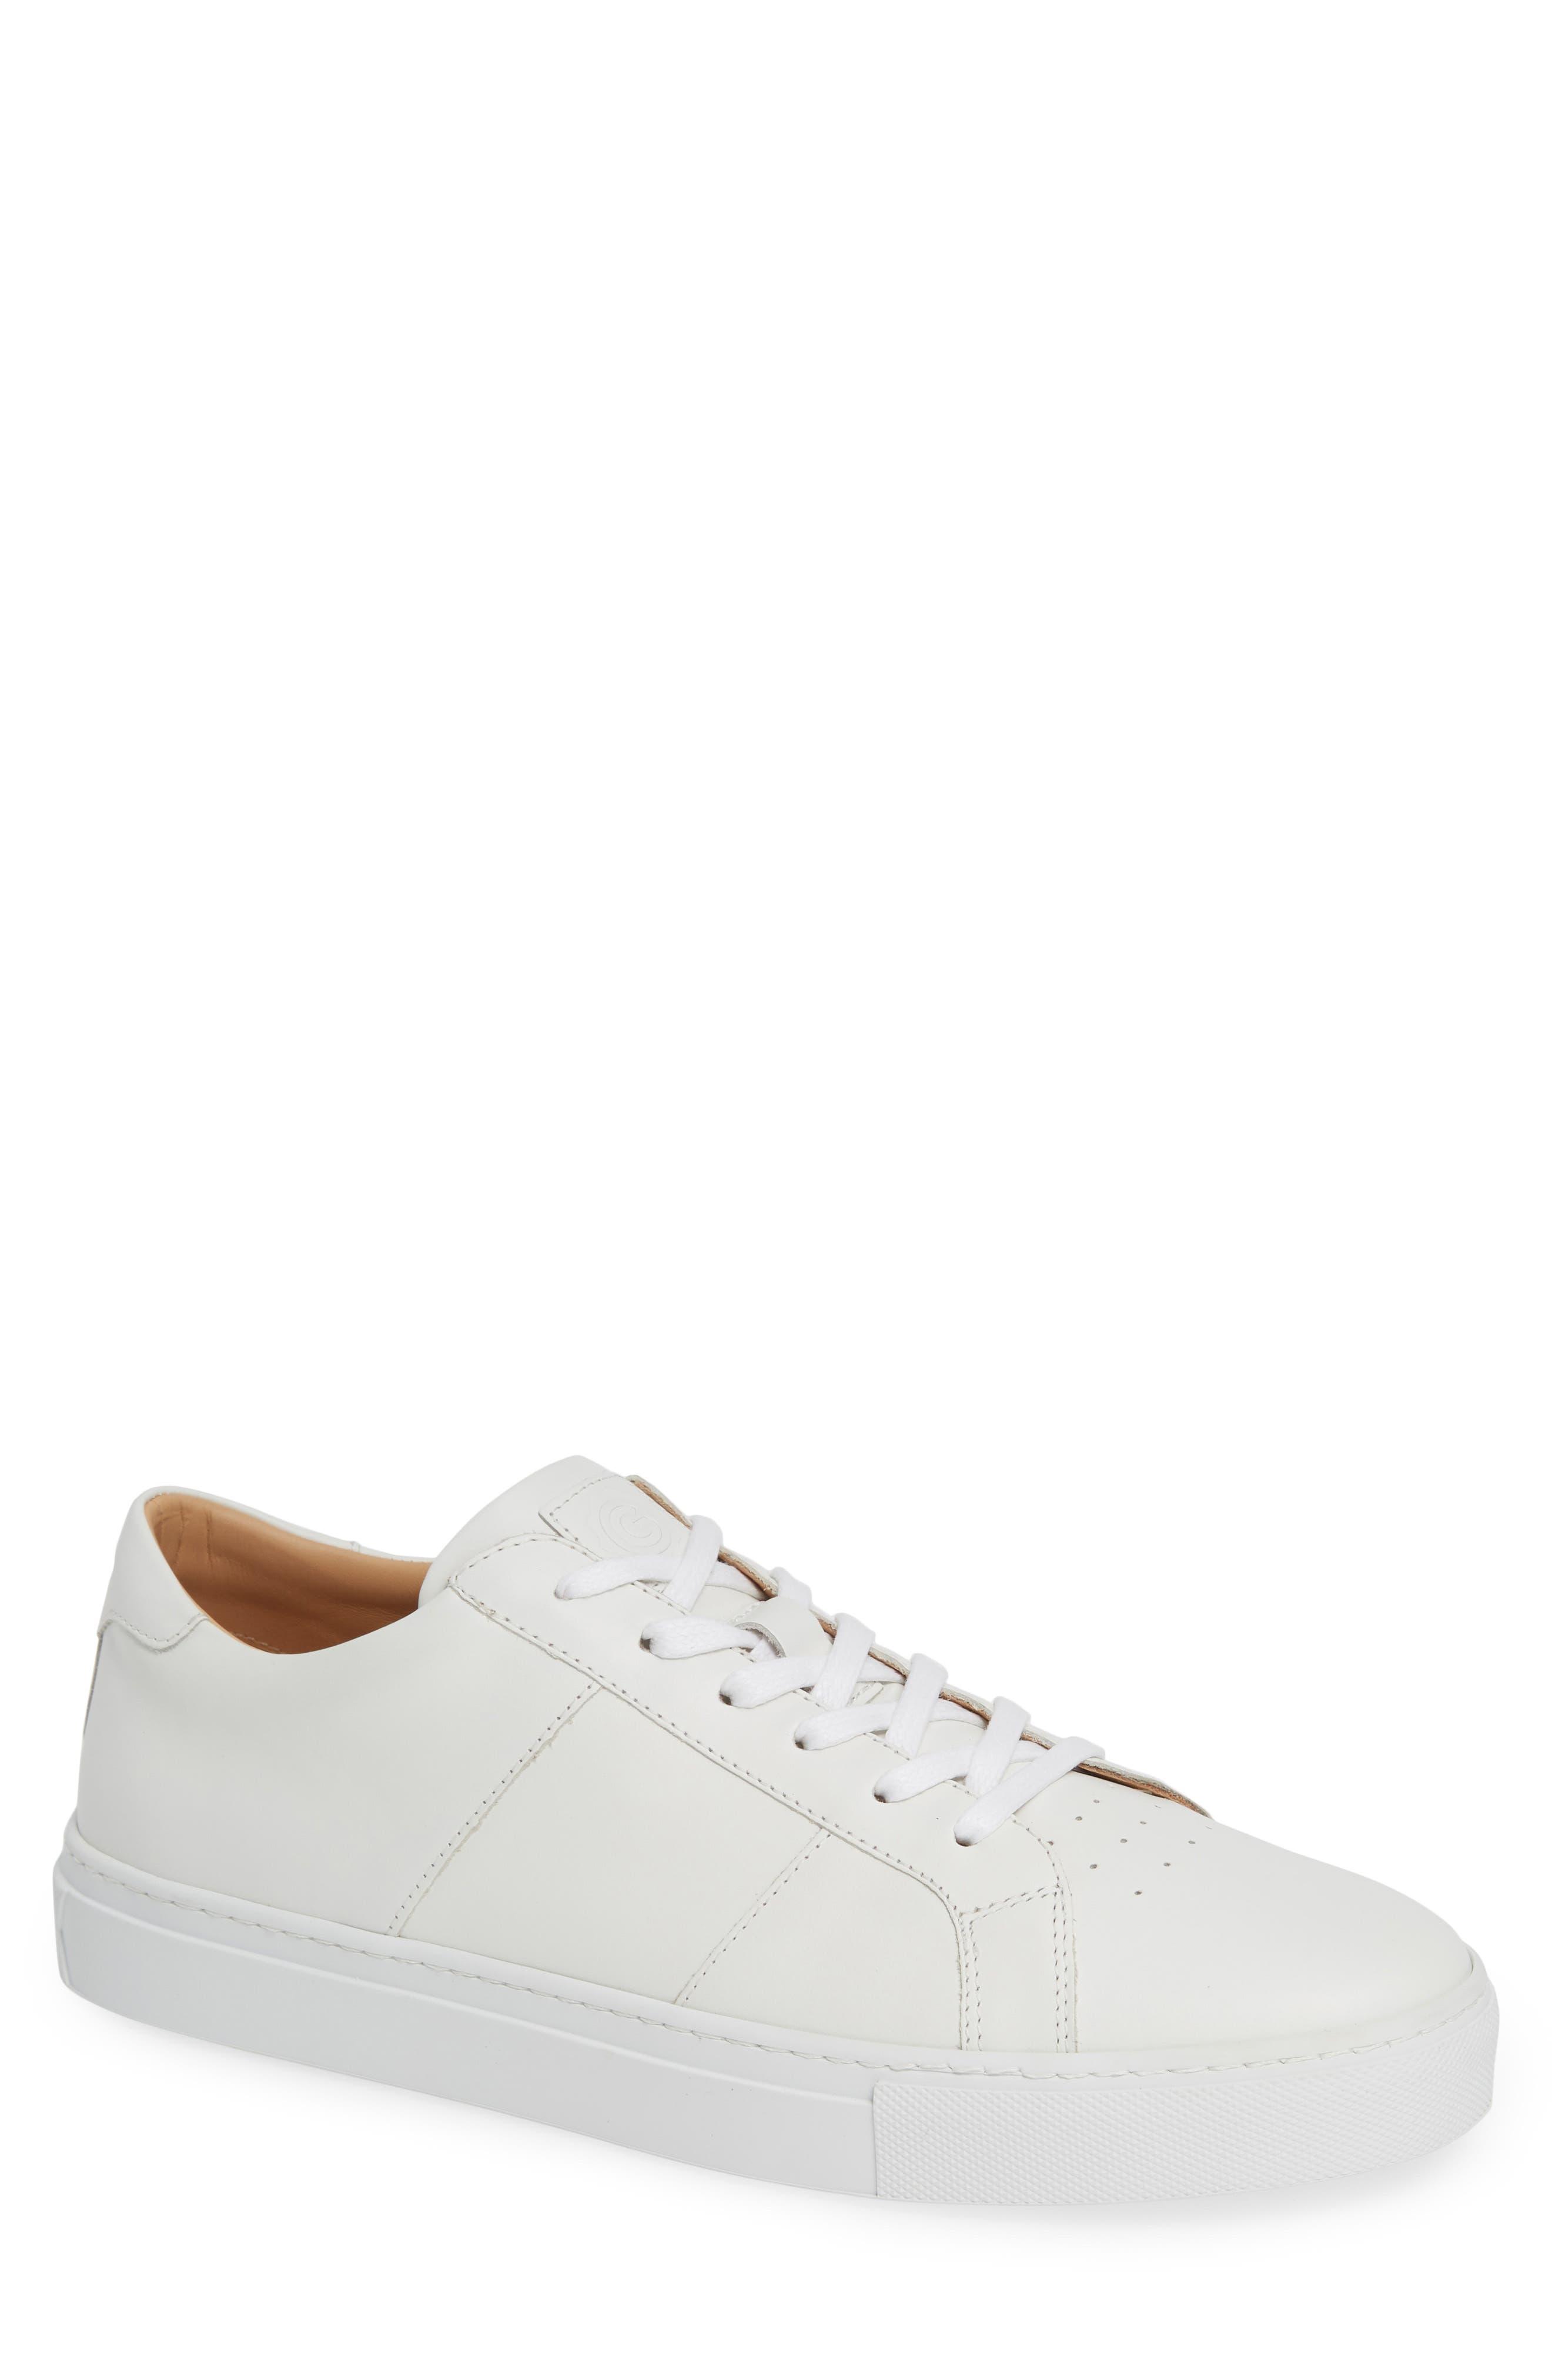 GREATS Royale Sneaker (Men)   Nordstrom